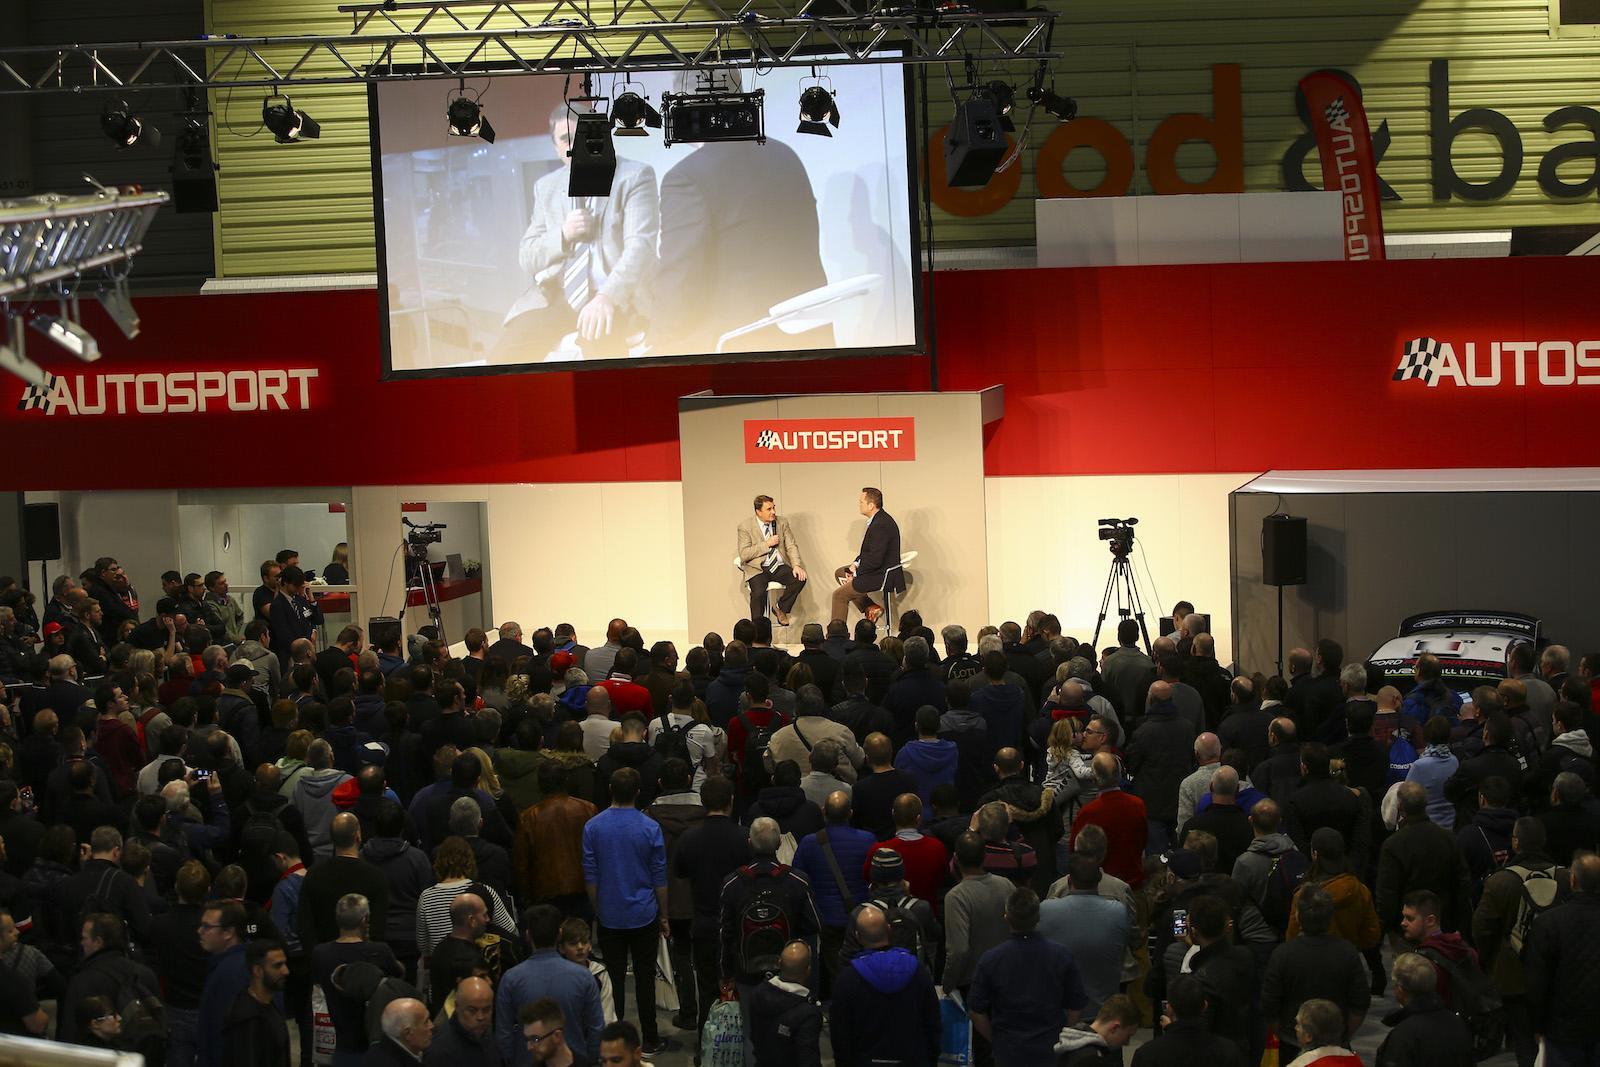 Autosport International attracts 95,000 visitors